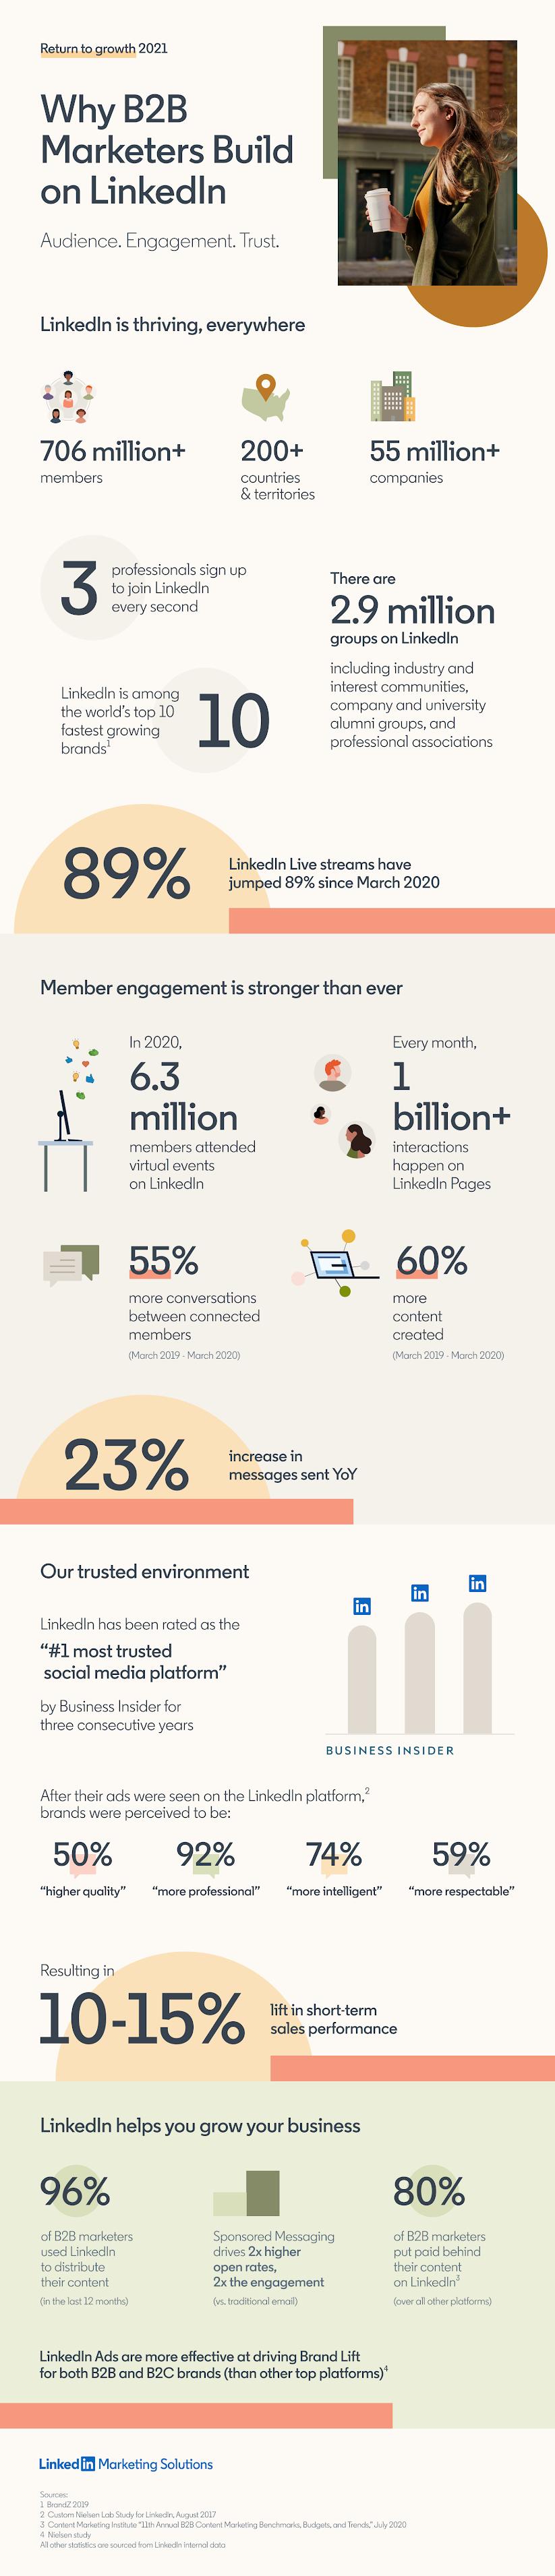 Why B2B Marketers Build On LinkedIn #infographic #LinkedIn #B2B #B2B Marketers #infographics #Marketing